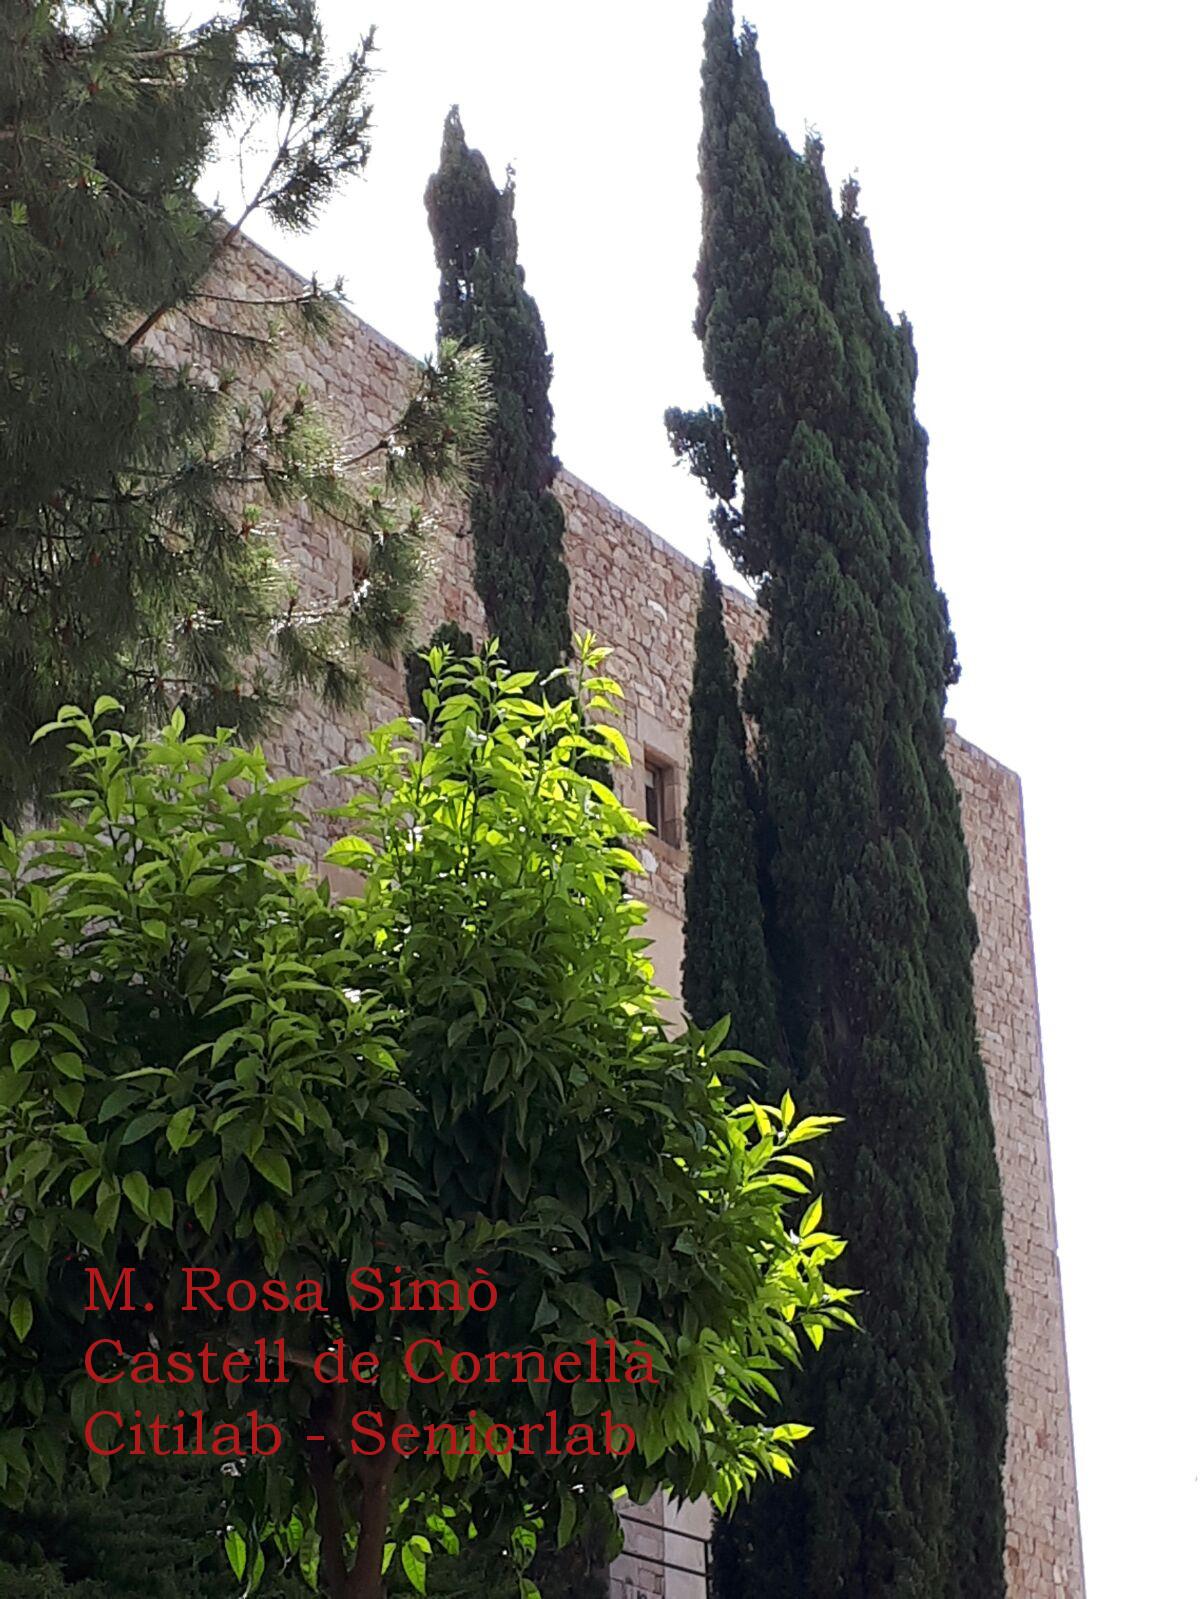 M. Rosa Simo